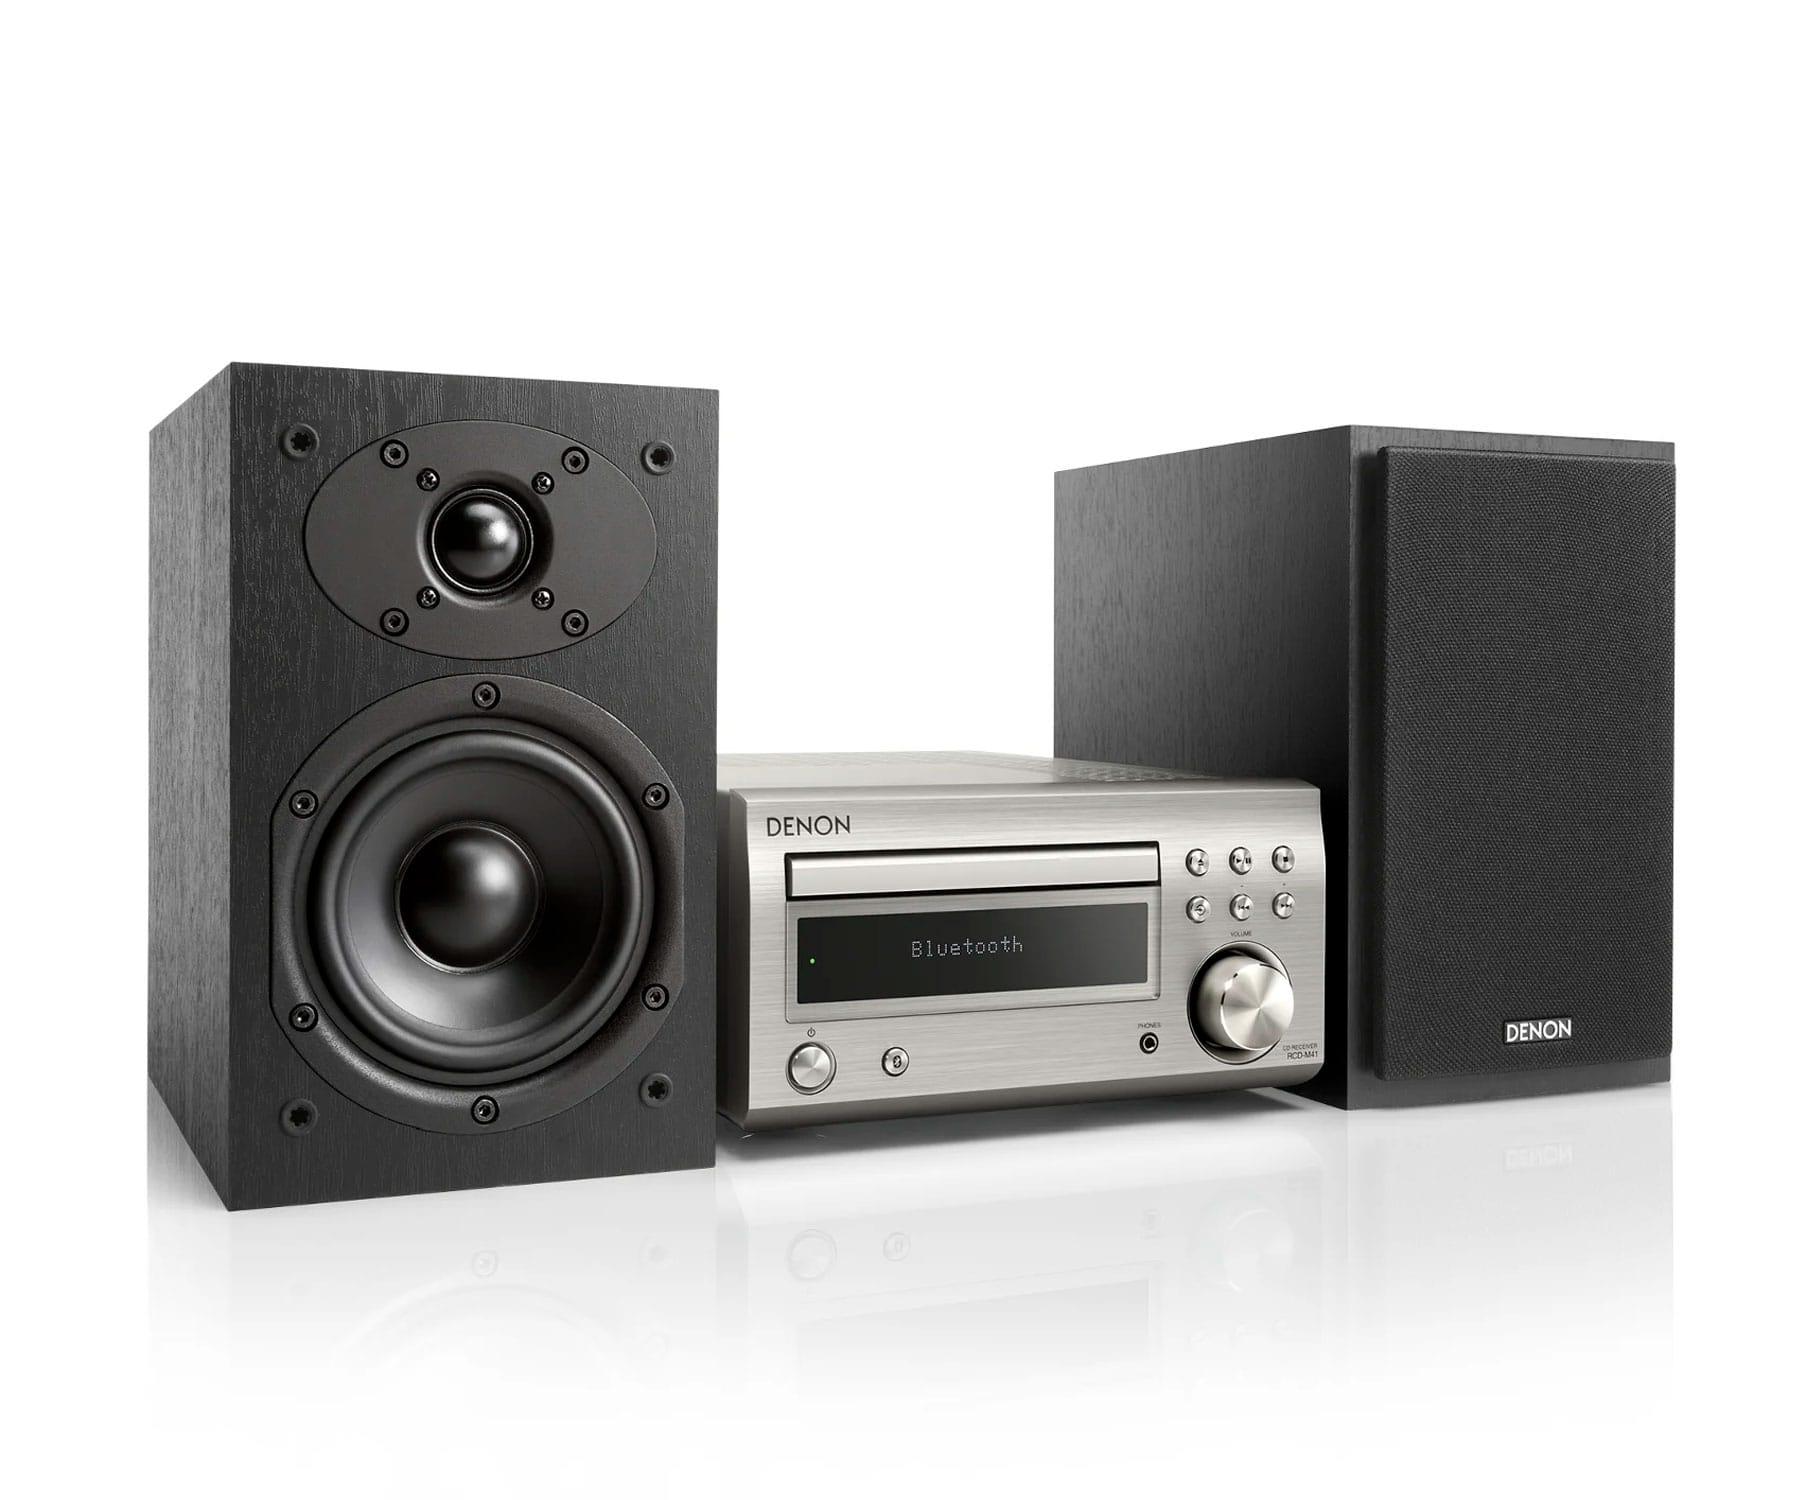 Denon DM-41 Plata/Negro Microcadena/Sistema Hi-Fi con CD/Bluetooth/Sintonizador FM/AM